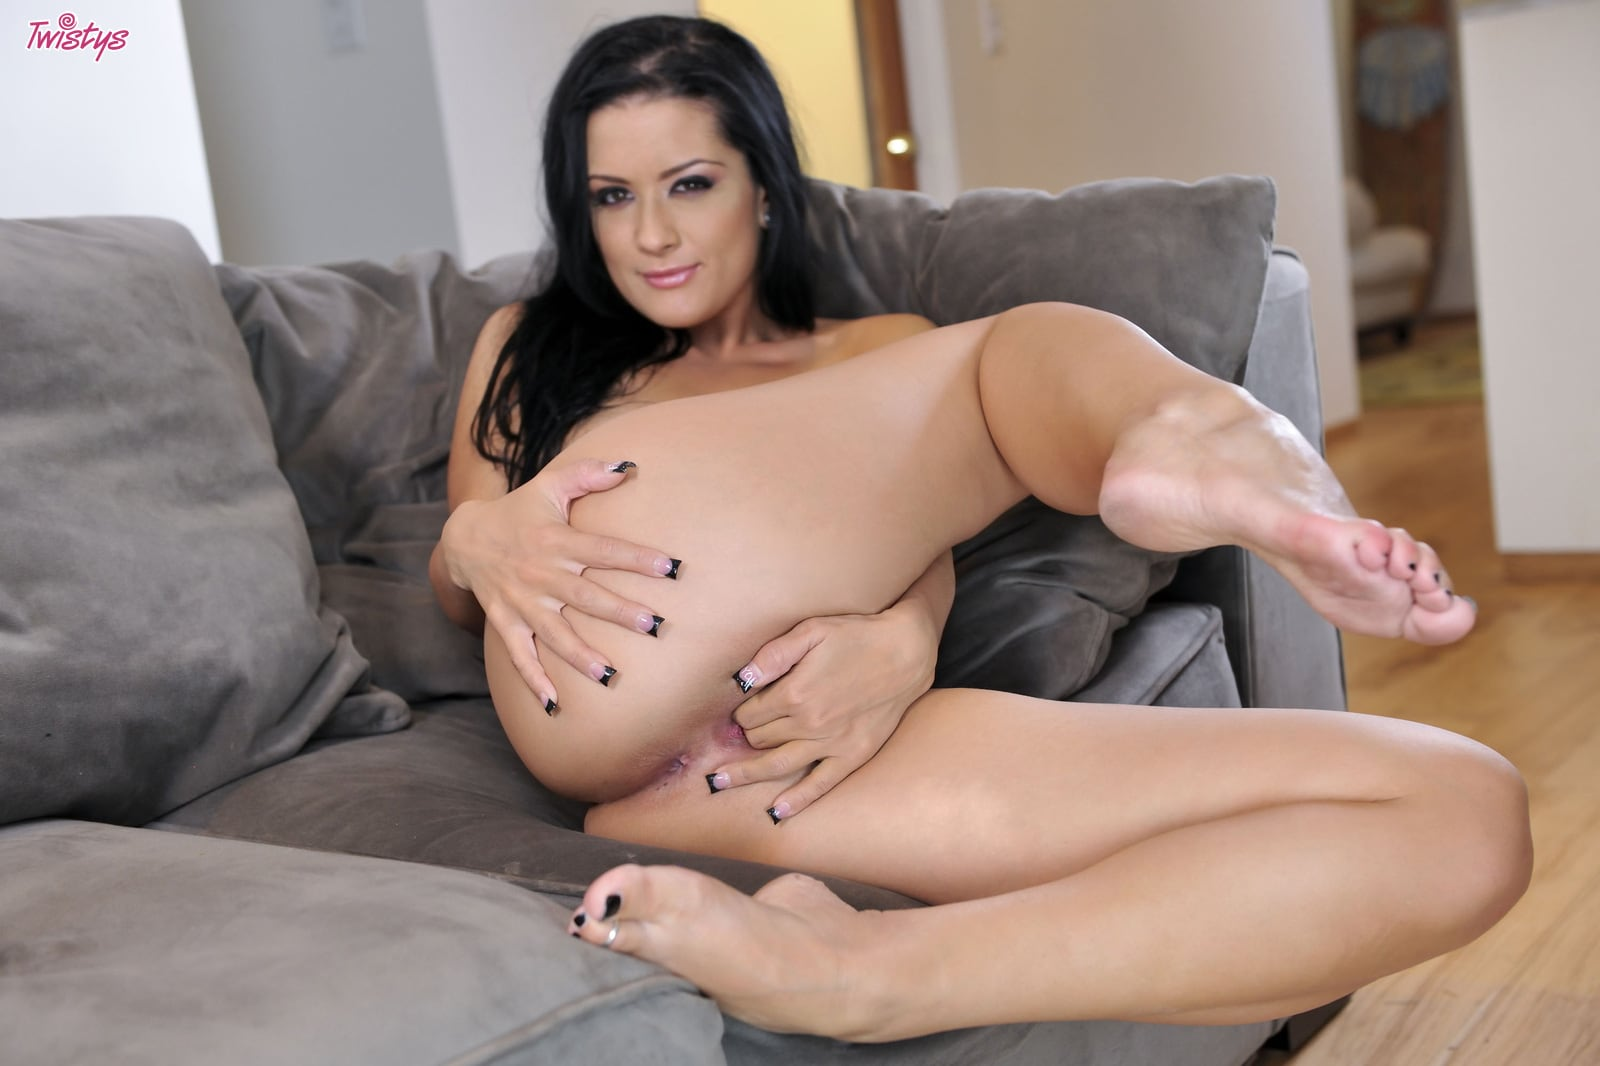 Katrina Jade  - Katrina Jade babepedia @Katrina_Jade